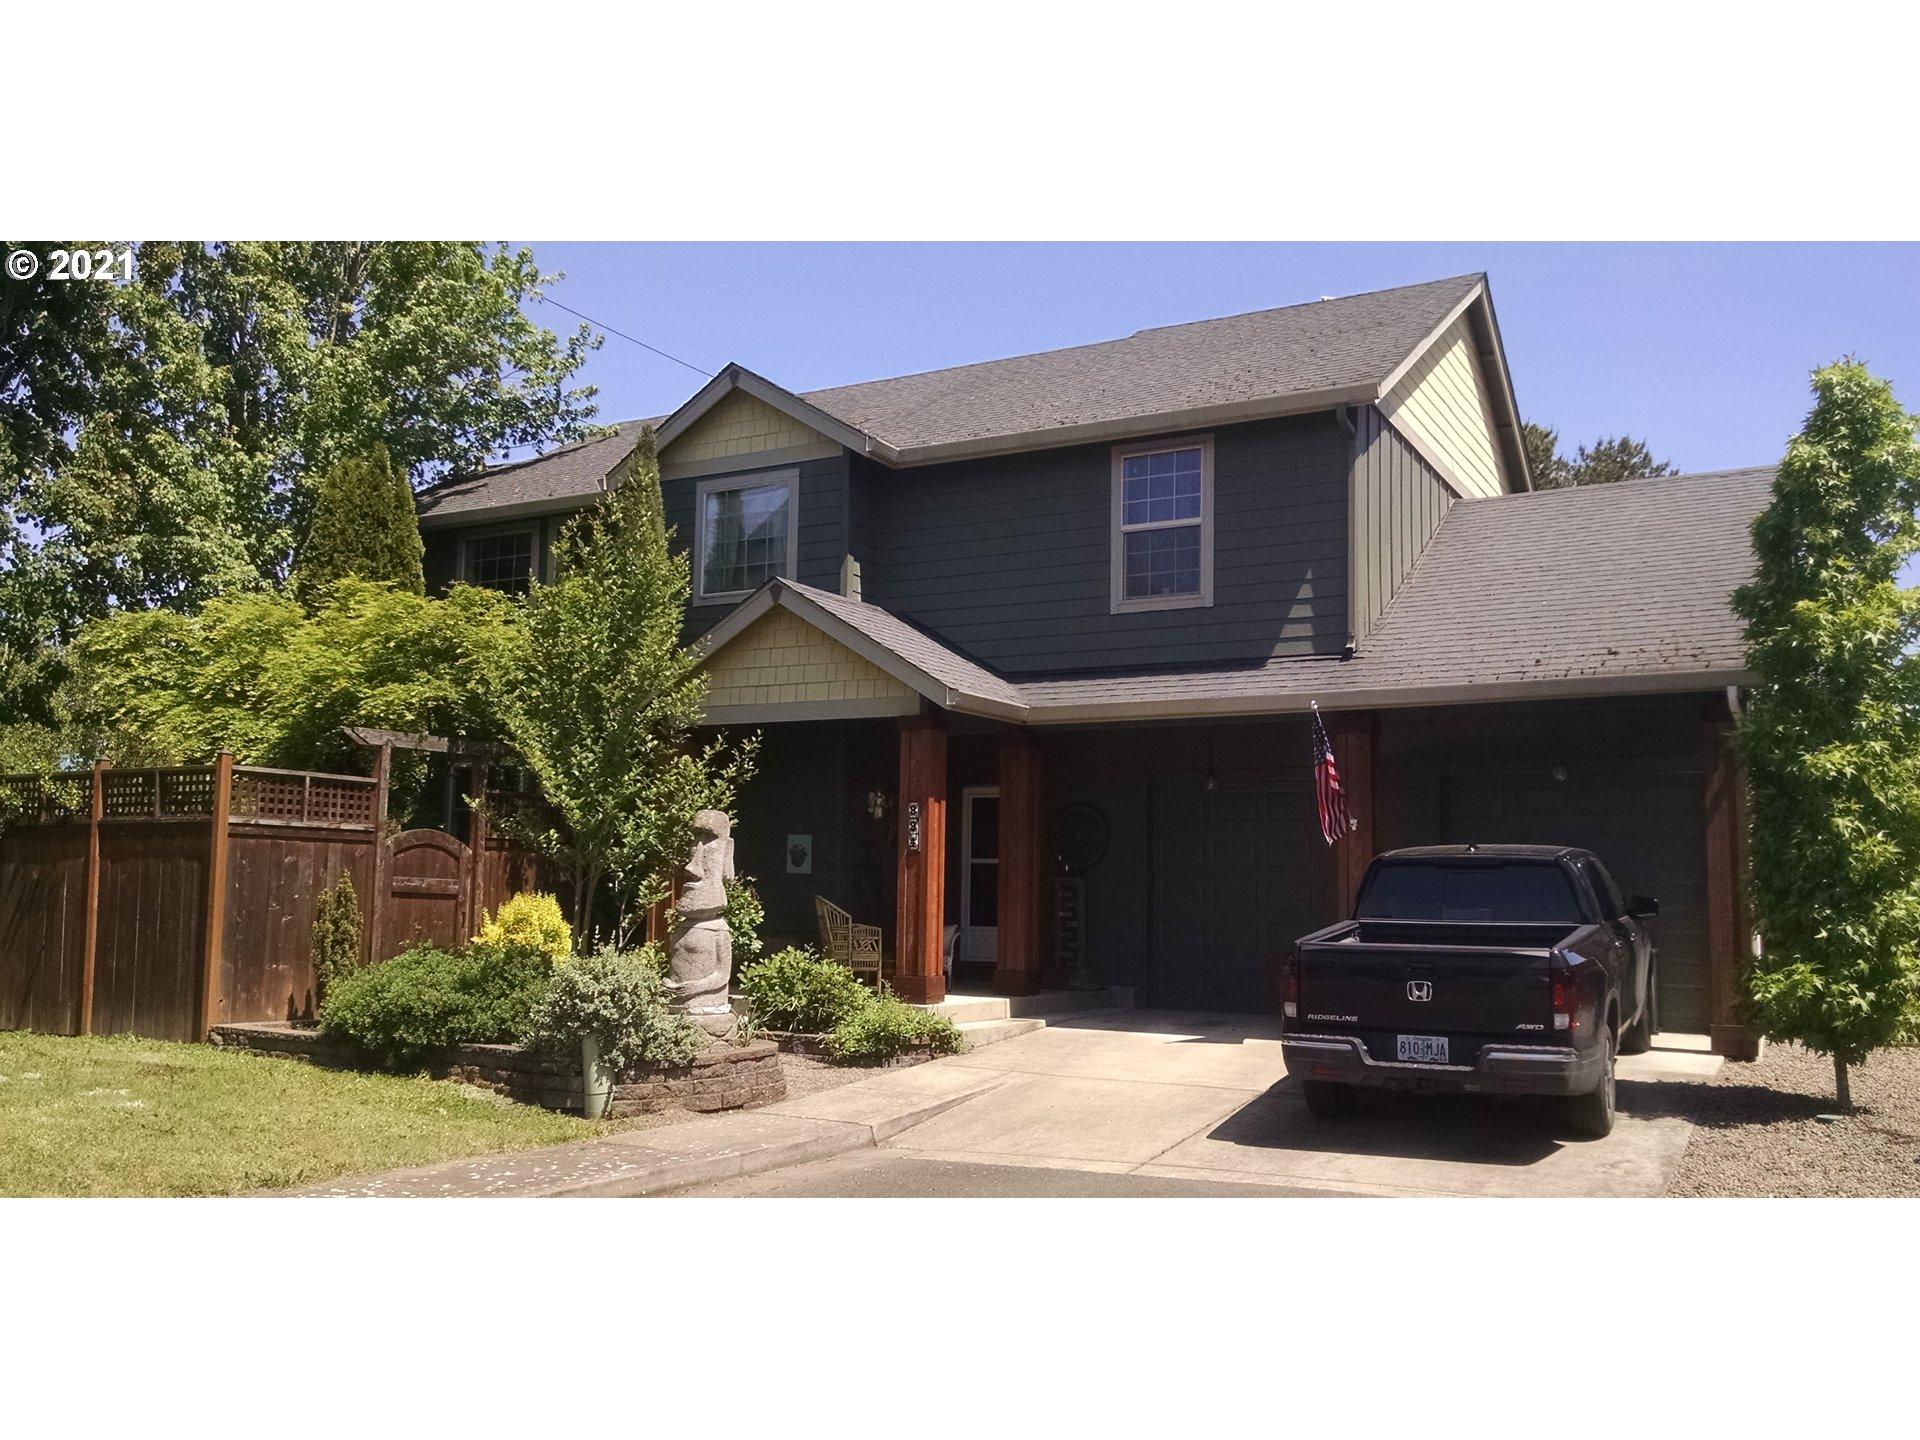 894 JACKIES LN, Eugene OR 97404